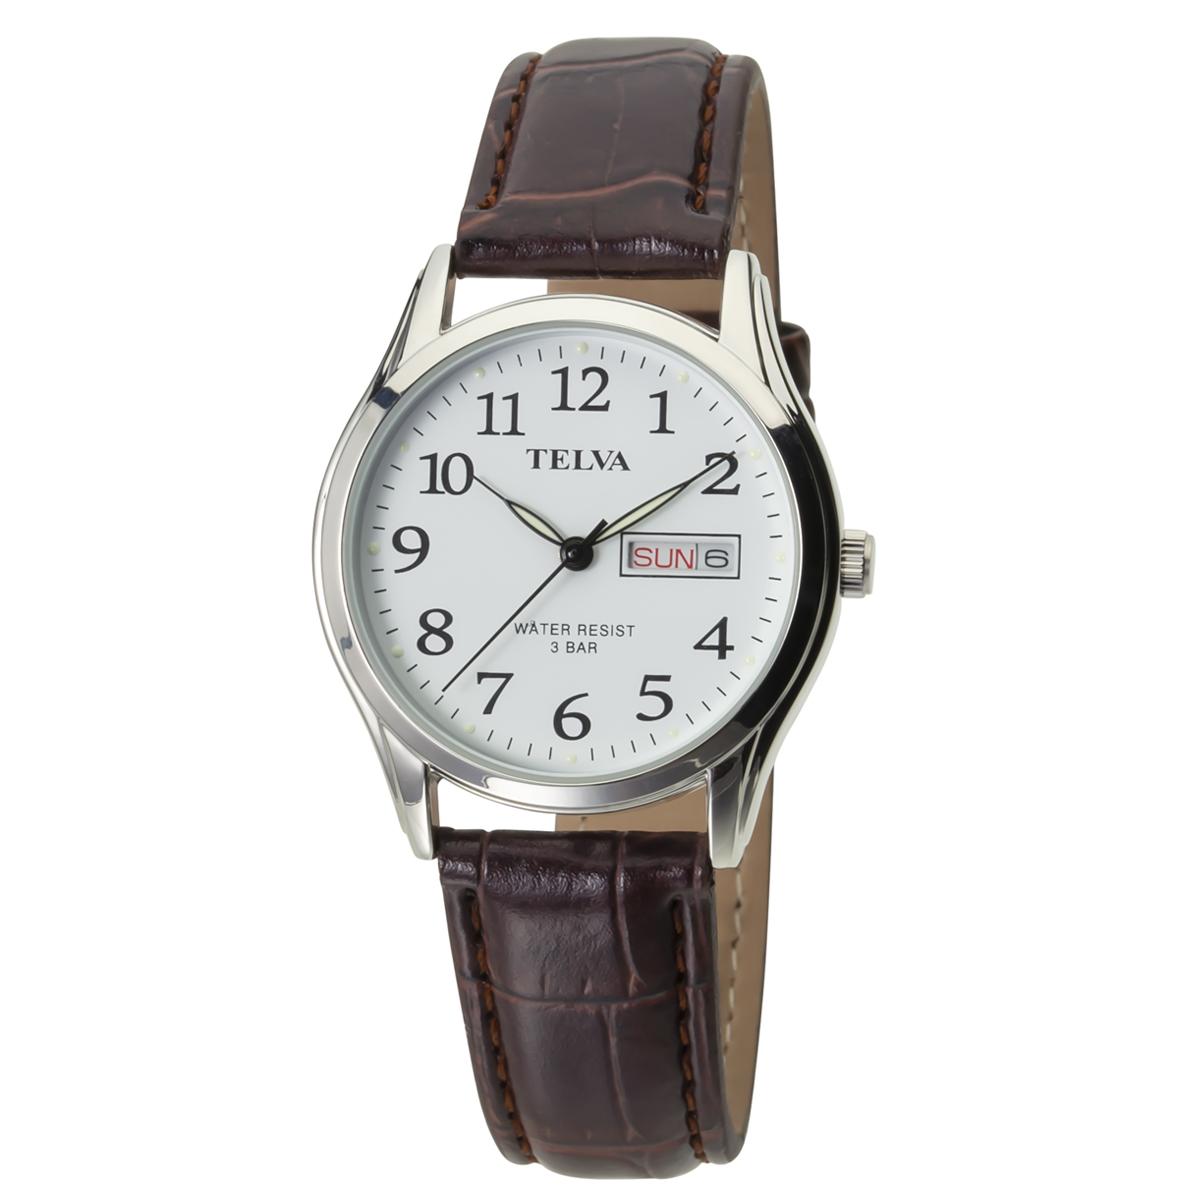 TELVA テルバ アナログウオッチ メンズ 曜日 日付 腕時計【TE-AM177】